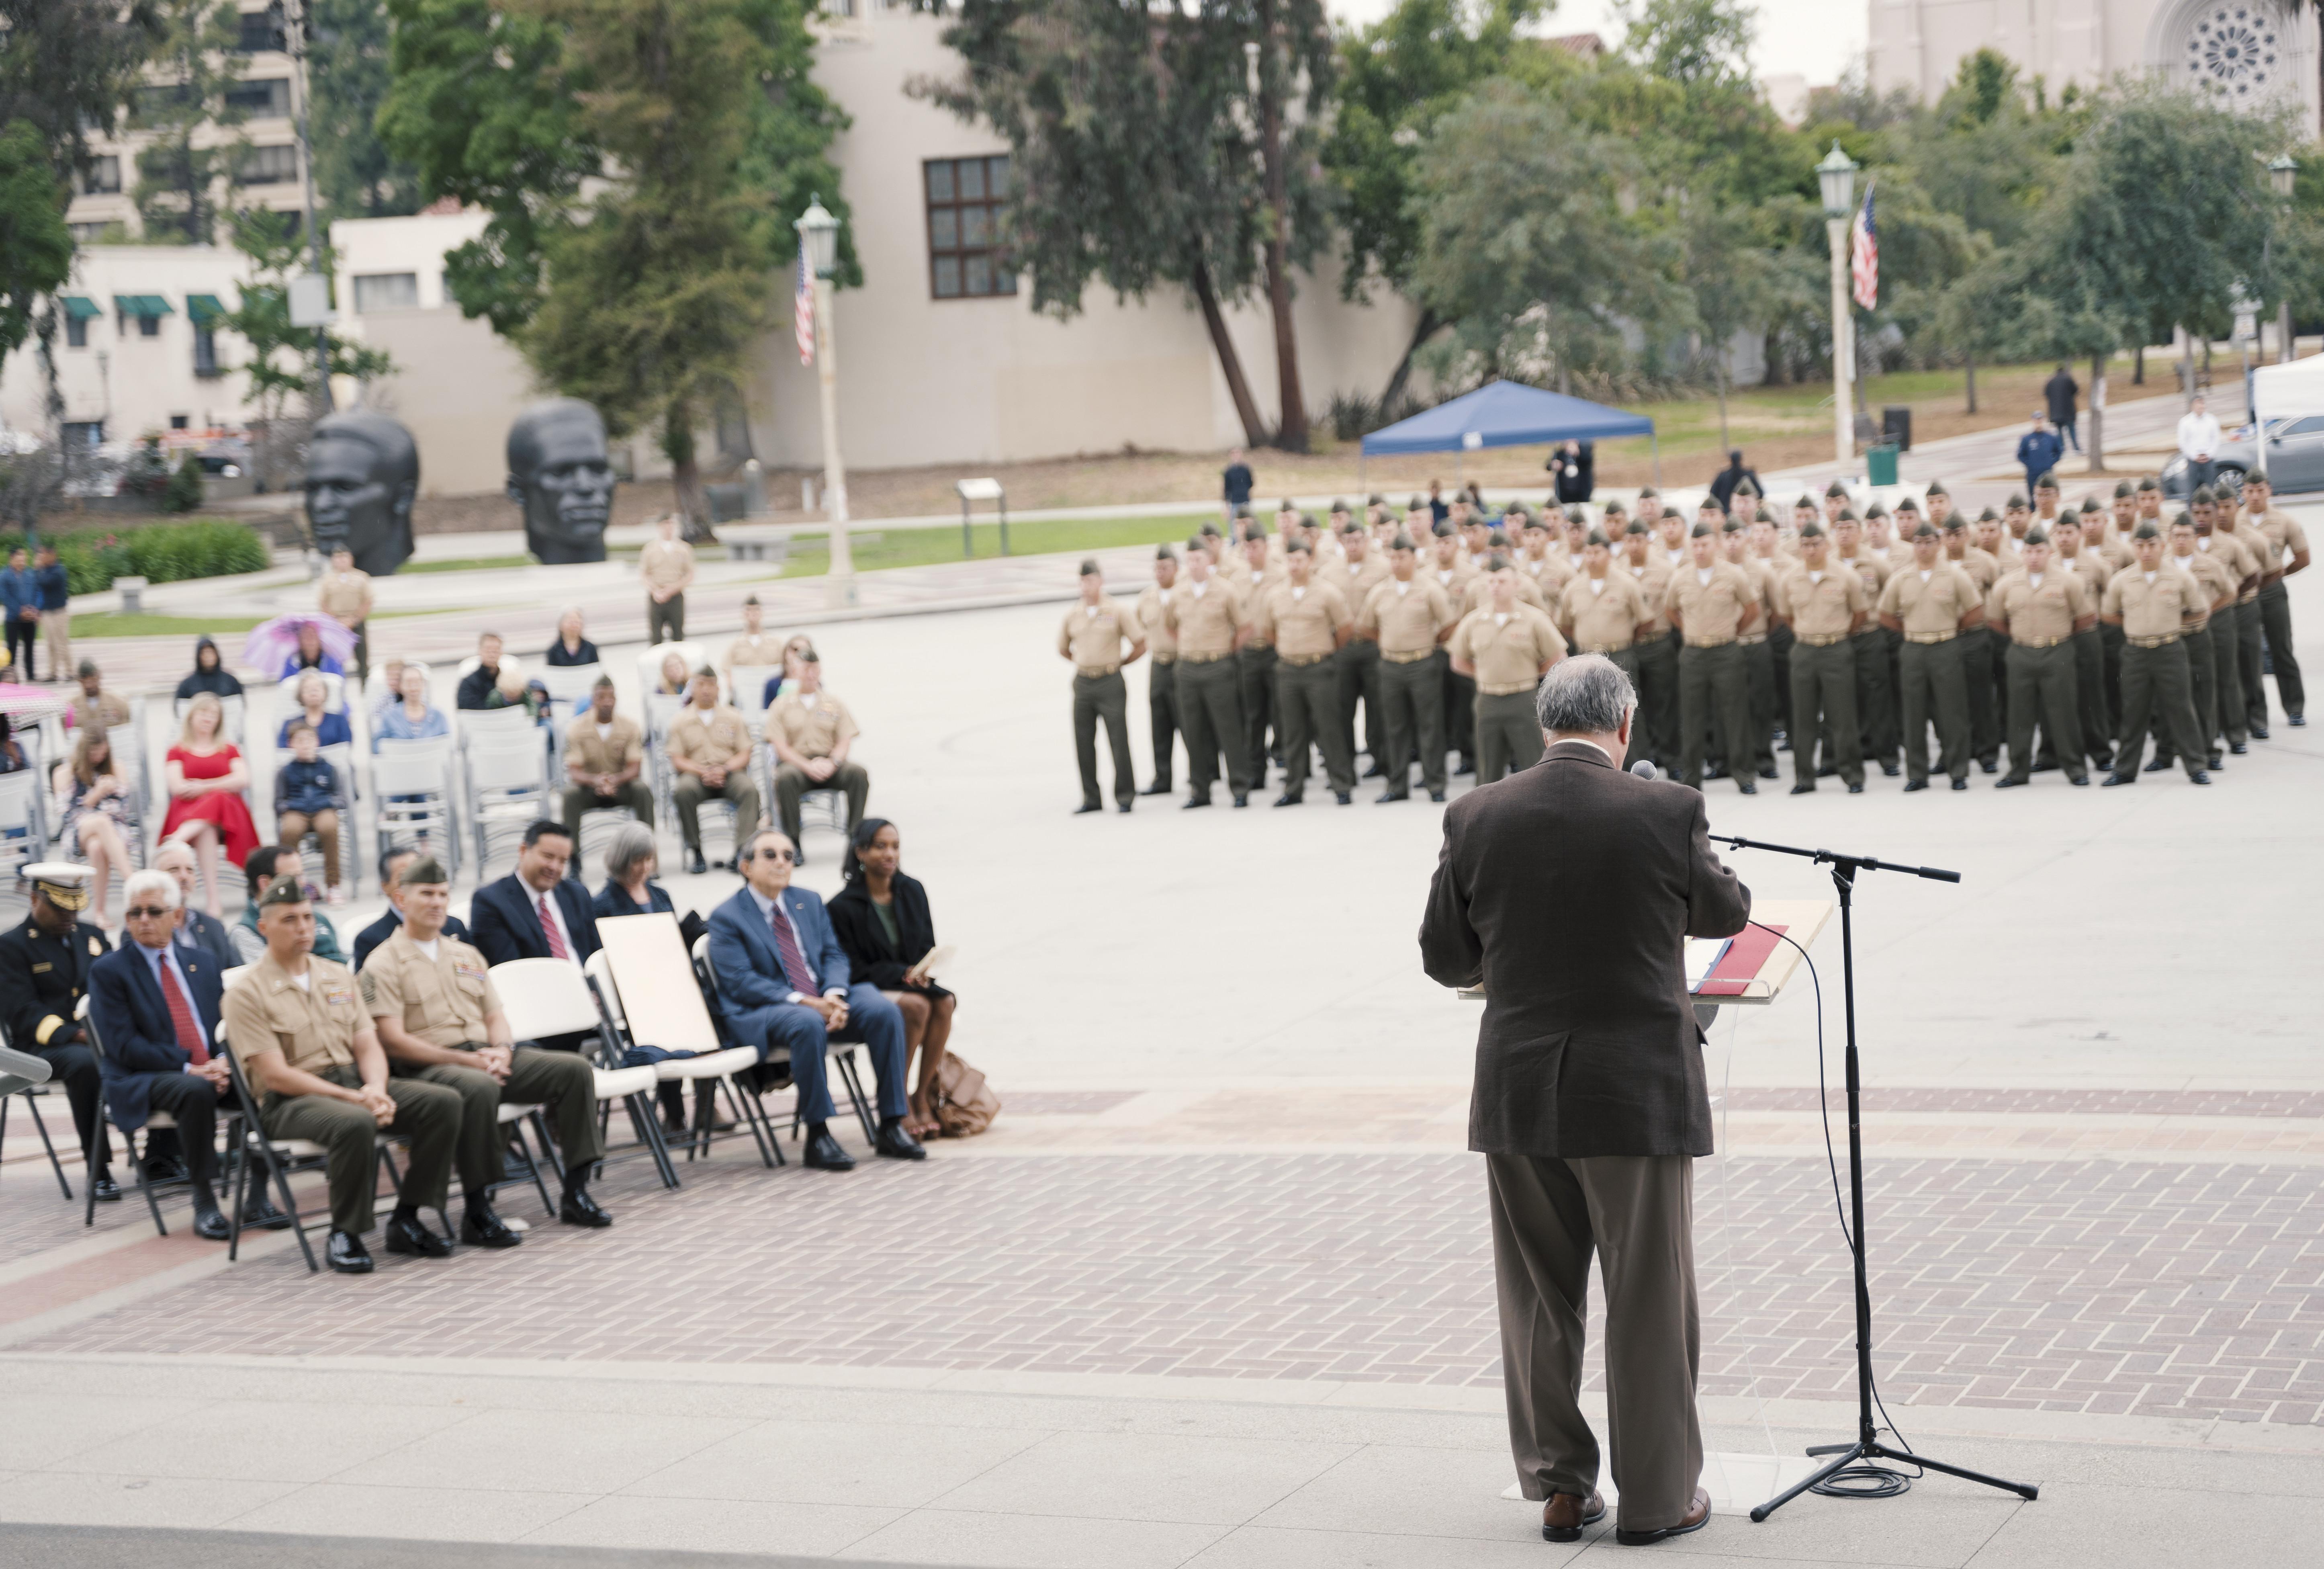 2nd Bn, 23rd Marine Regiment Deployment Homecoming Event